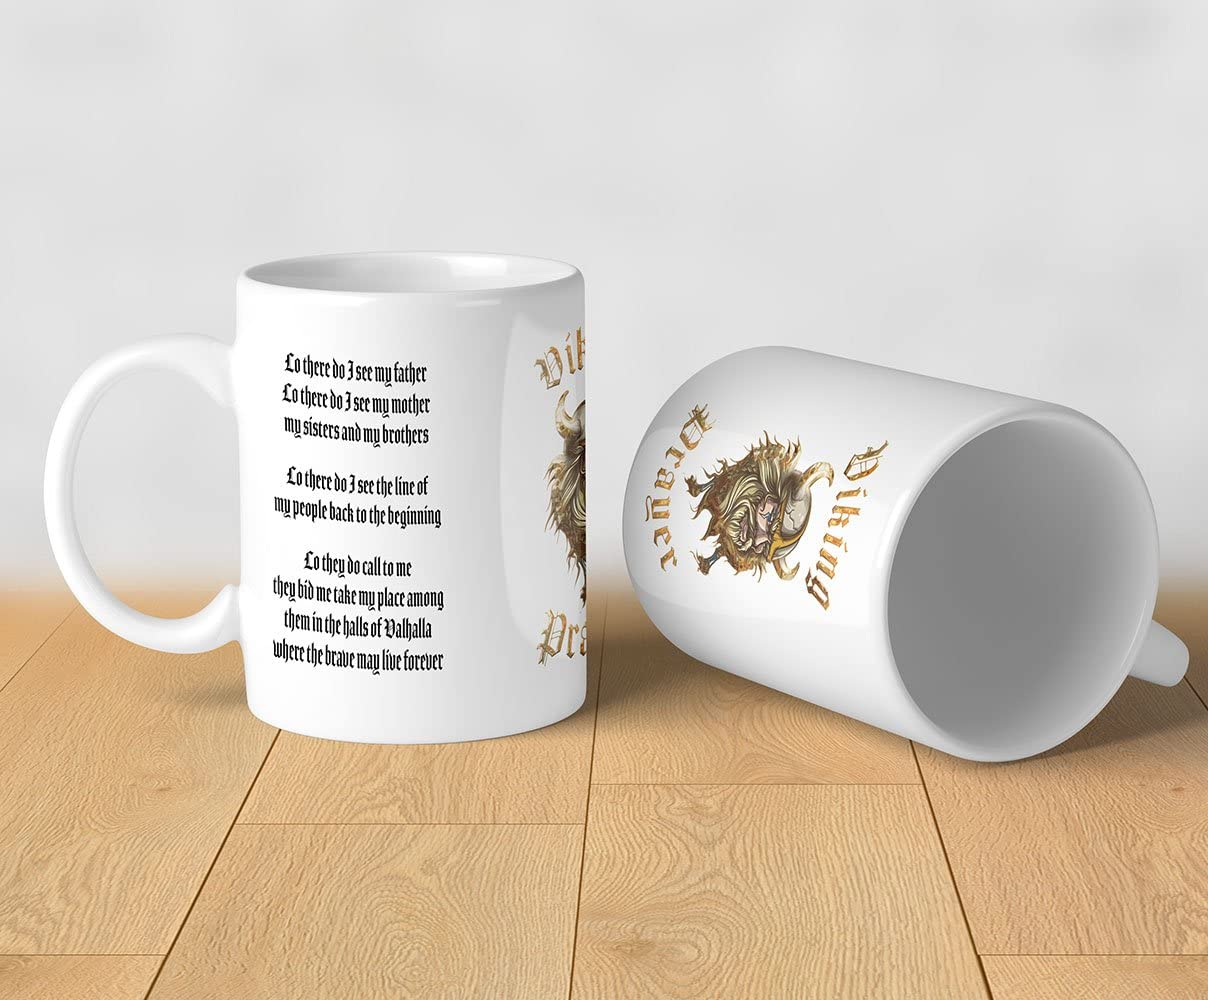 Viking Prayer Mug Lo There Do I See My Father Lo There Do I See My Mother My Sisters And My Brothers 11oz White Ceramic Tea Coffee Mug Amazon Ca Home